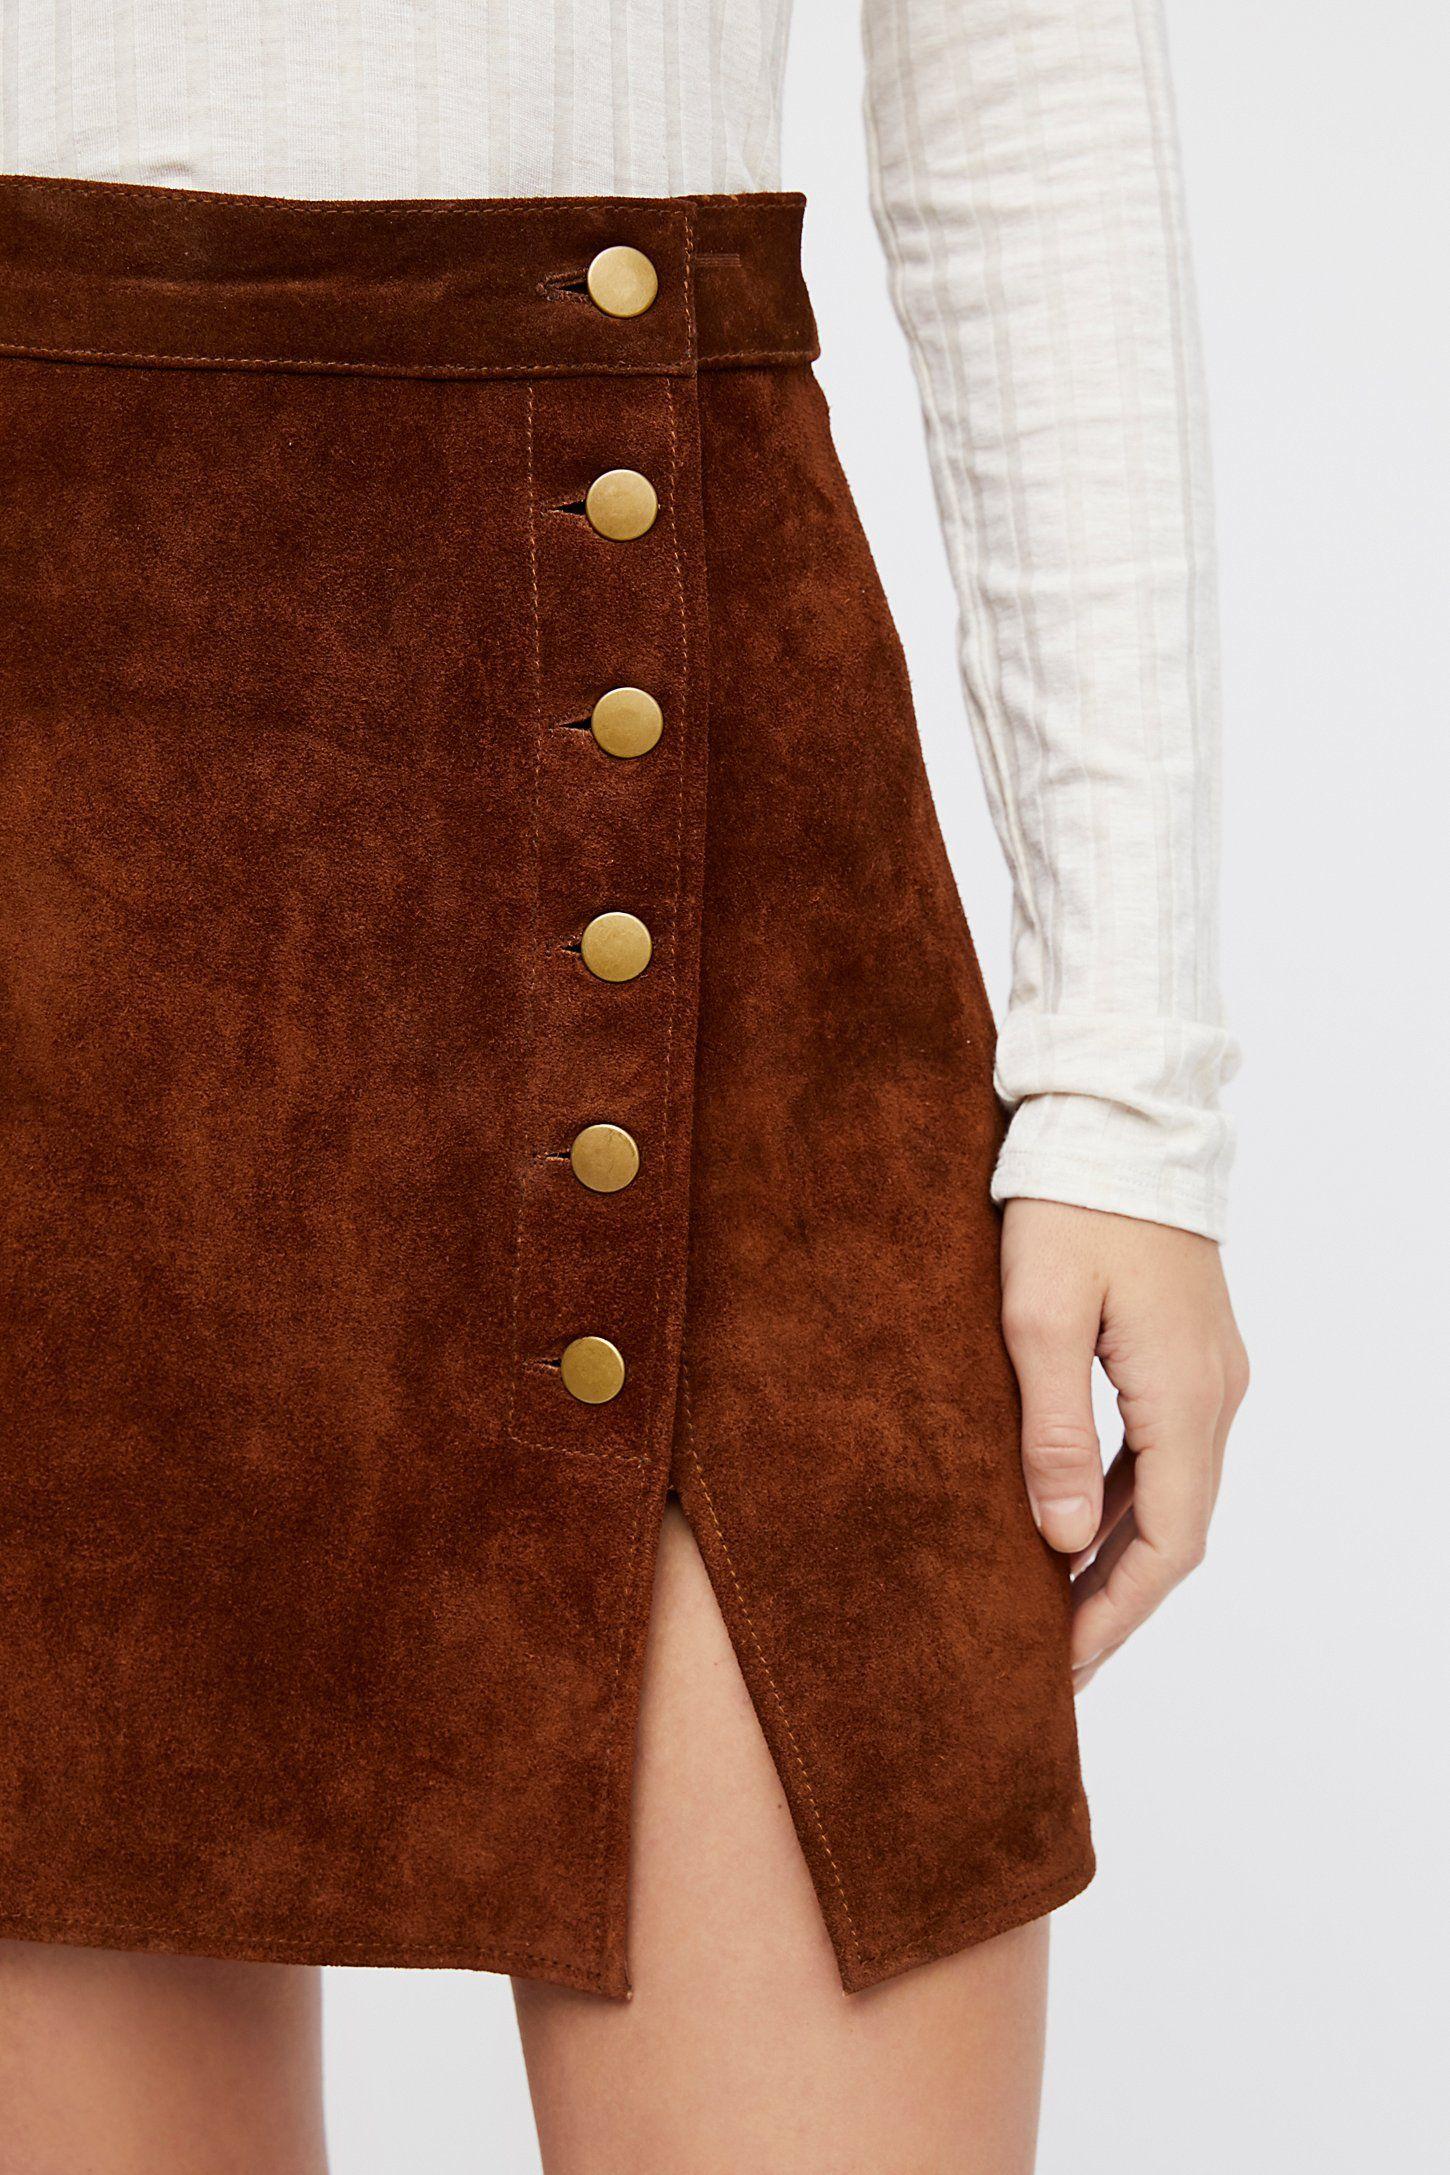 f68b3d9220fd Understated Suede Mini Skirt en 2019 | faldas | Moda estilo, Faldas ...